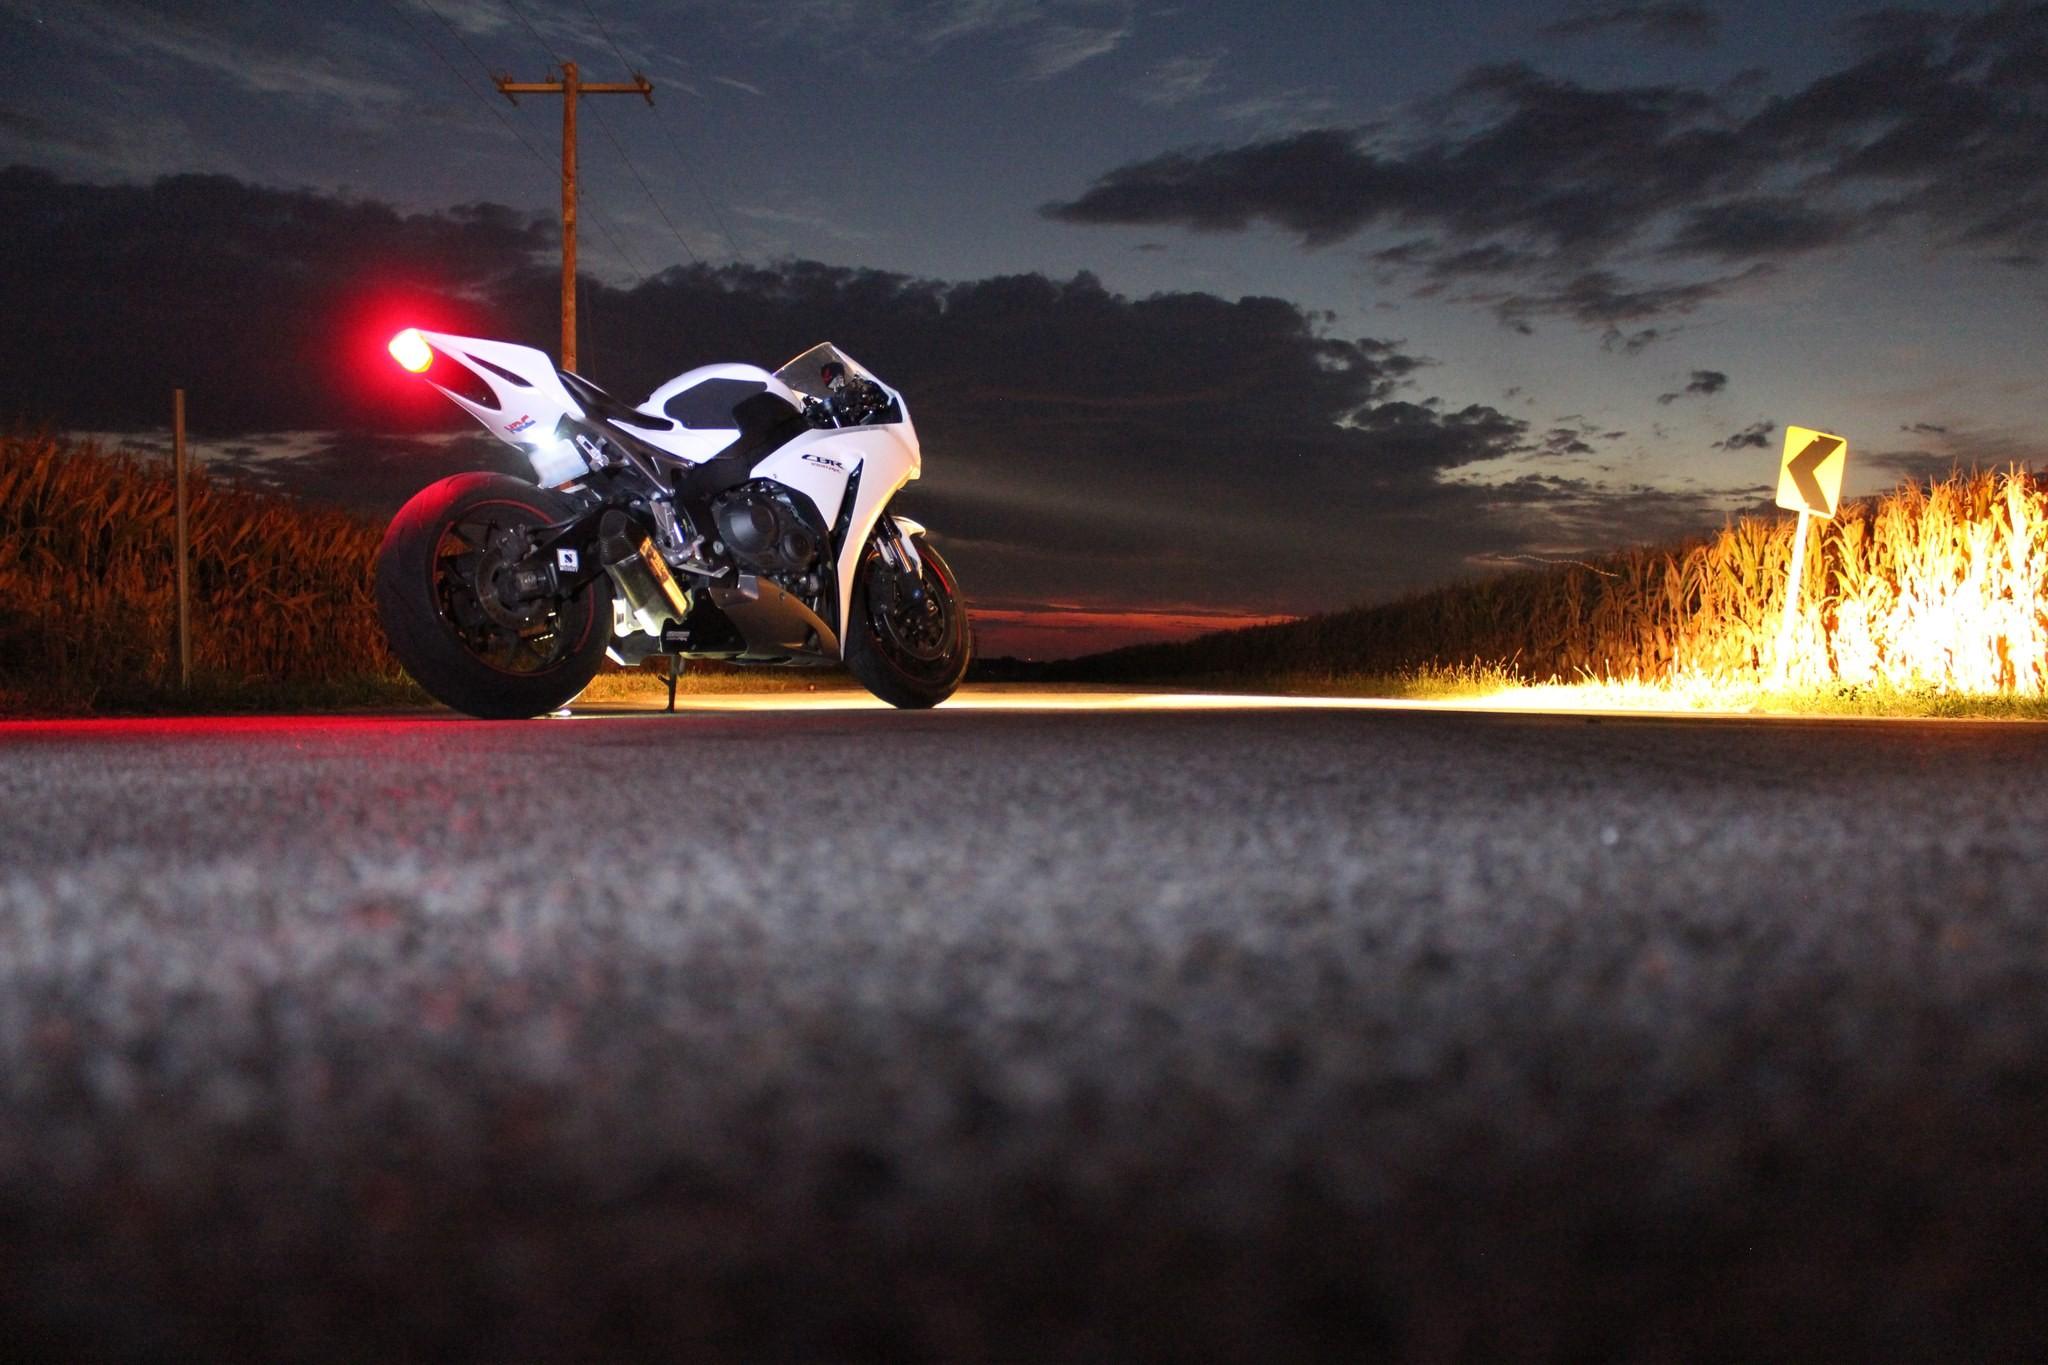 картинки мотоциклов с разрешением